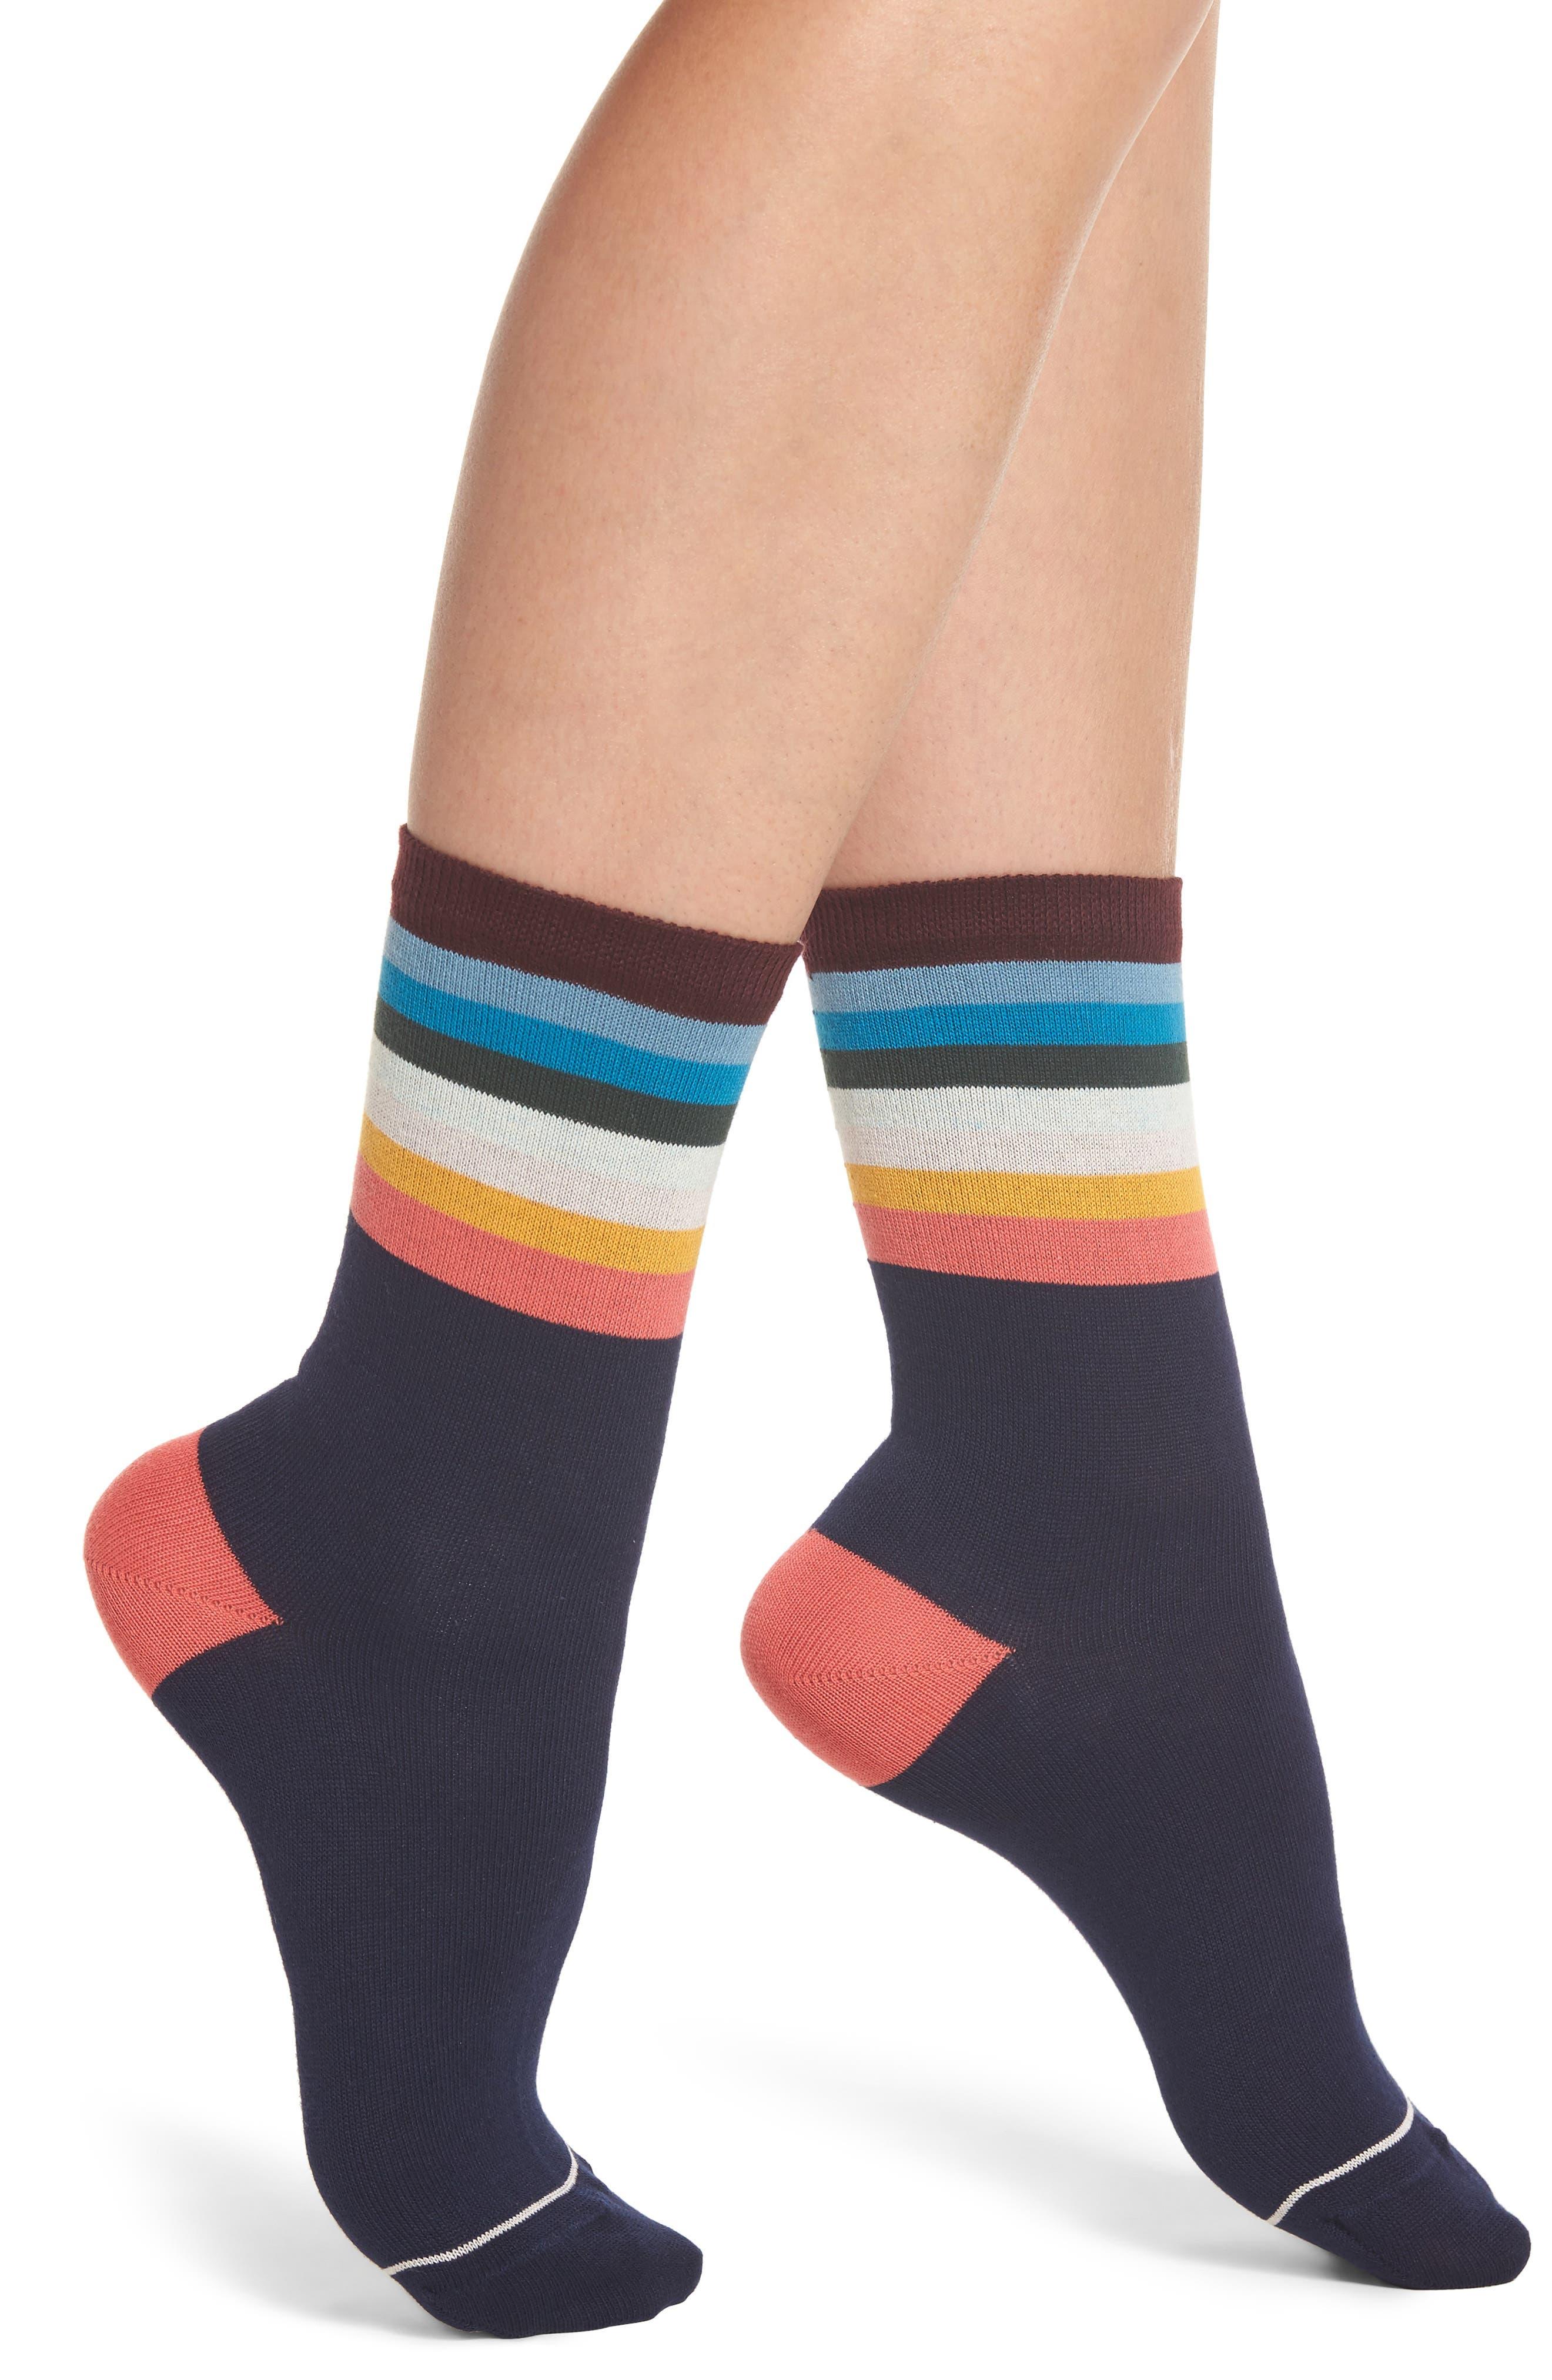 Cindy Artist Stripe Ankle Socks,                             Main thumbnail 1, color,                             415